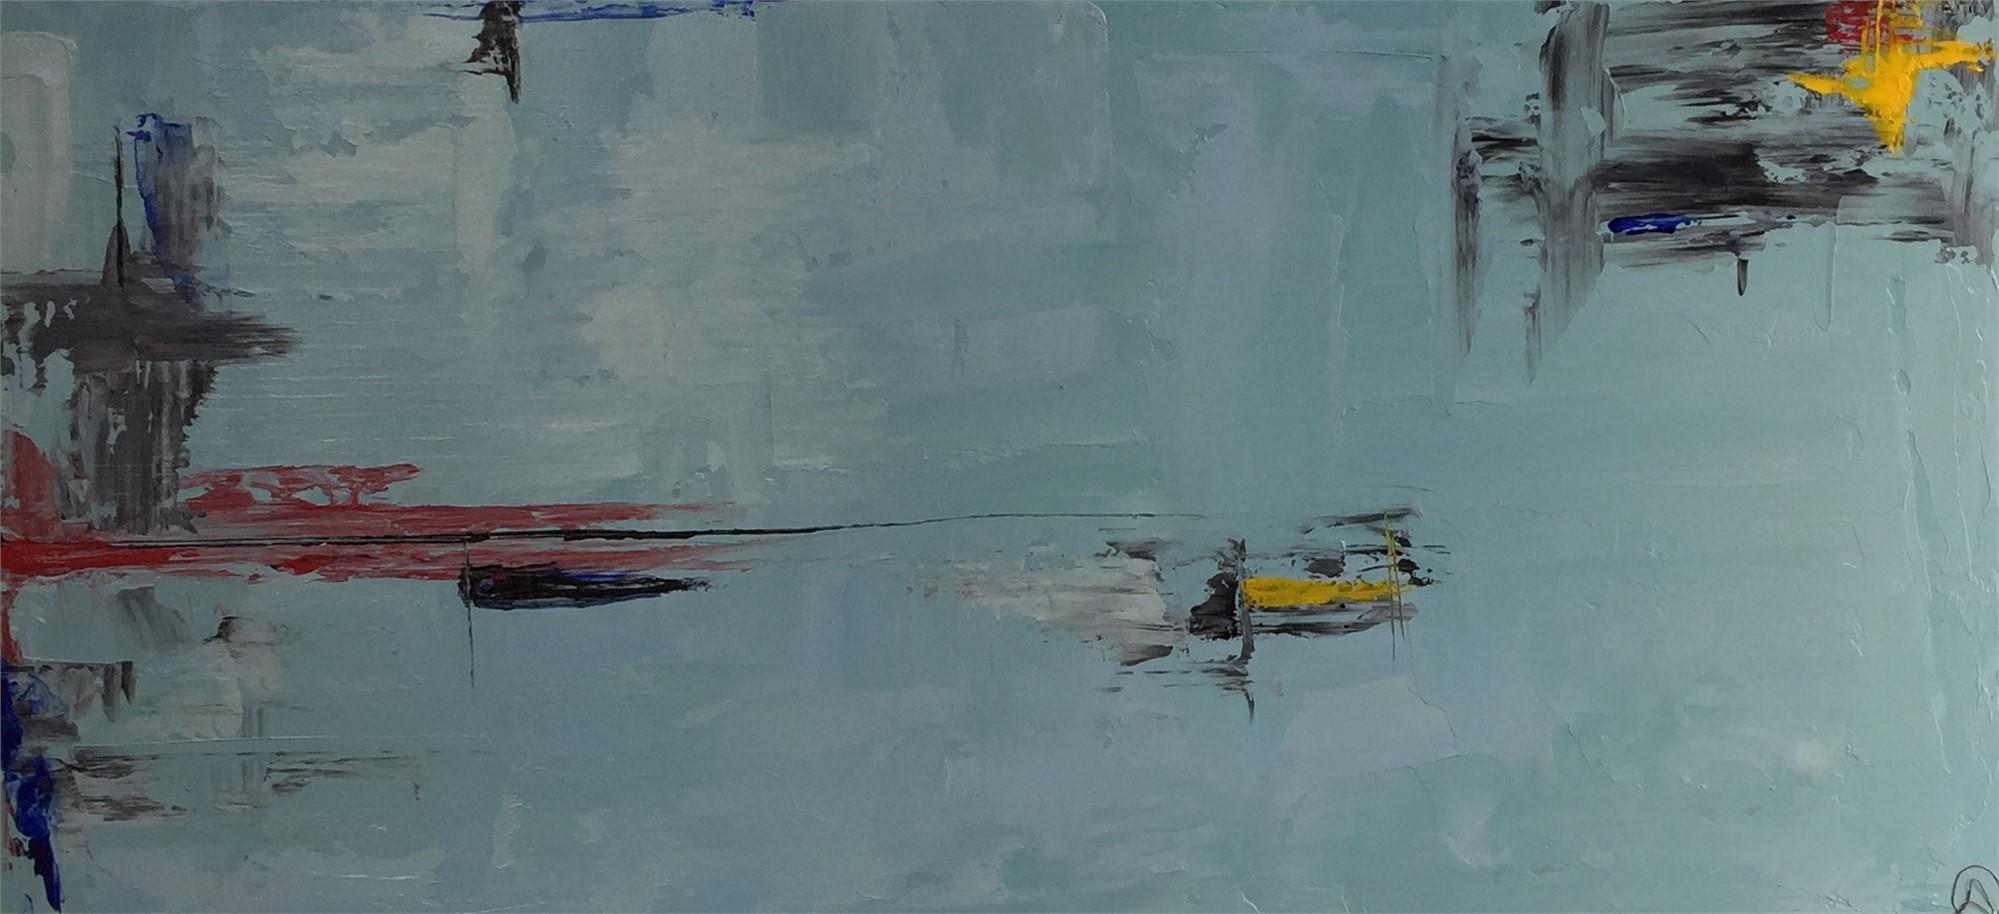 Portsmouth by Andrea Kreeger